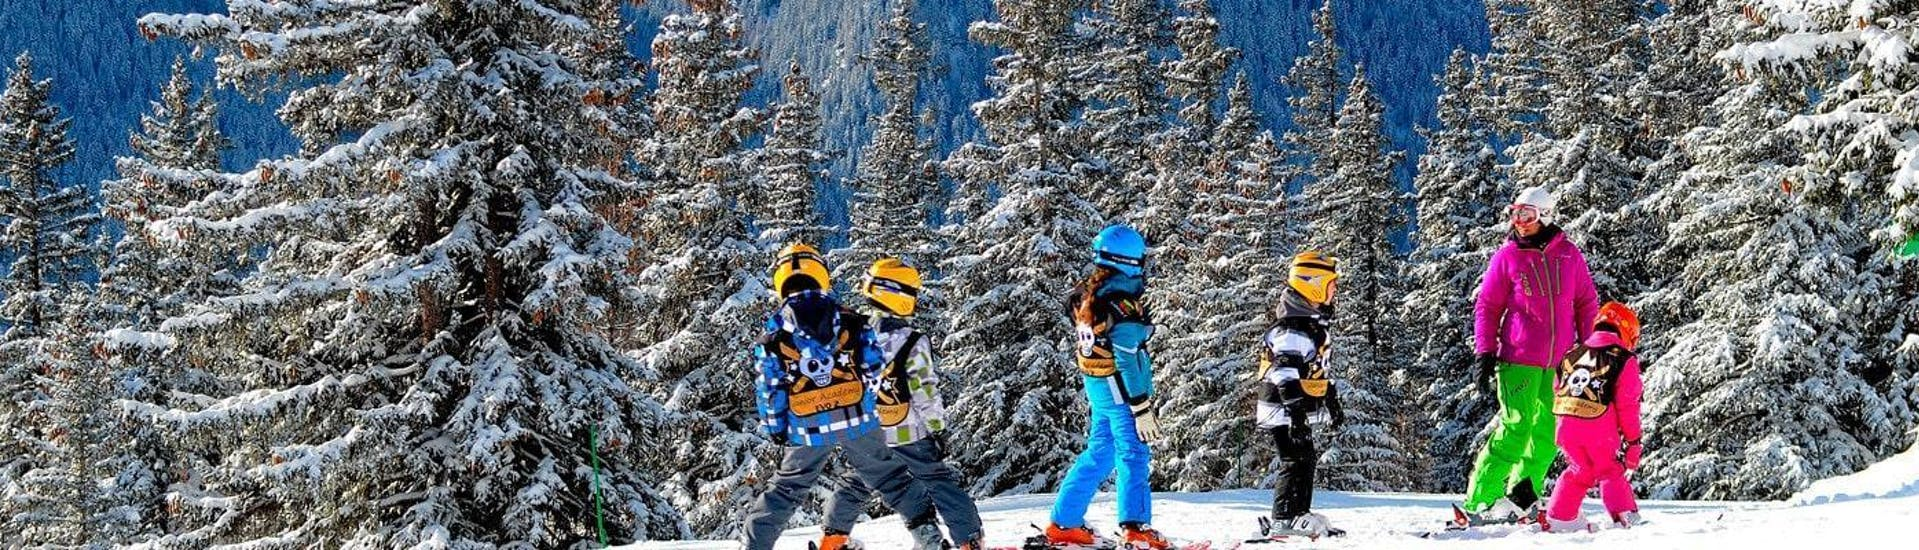 kids-ski-lessons-6-18-years-morning-low-season-evo-2-val-d-isere-hero